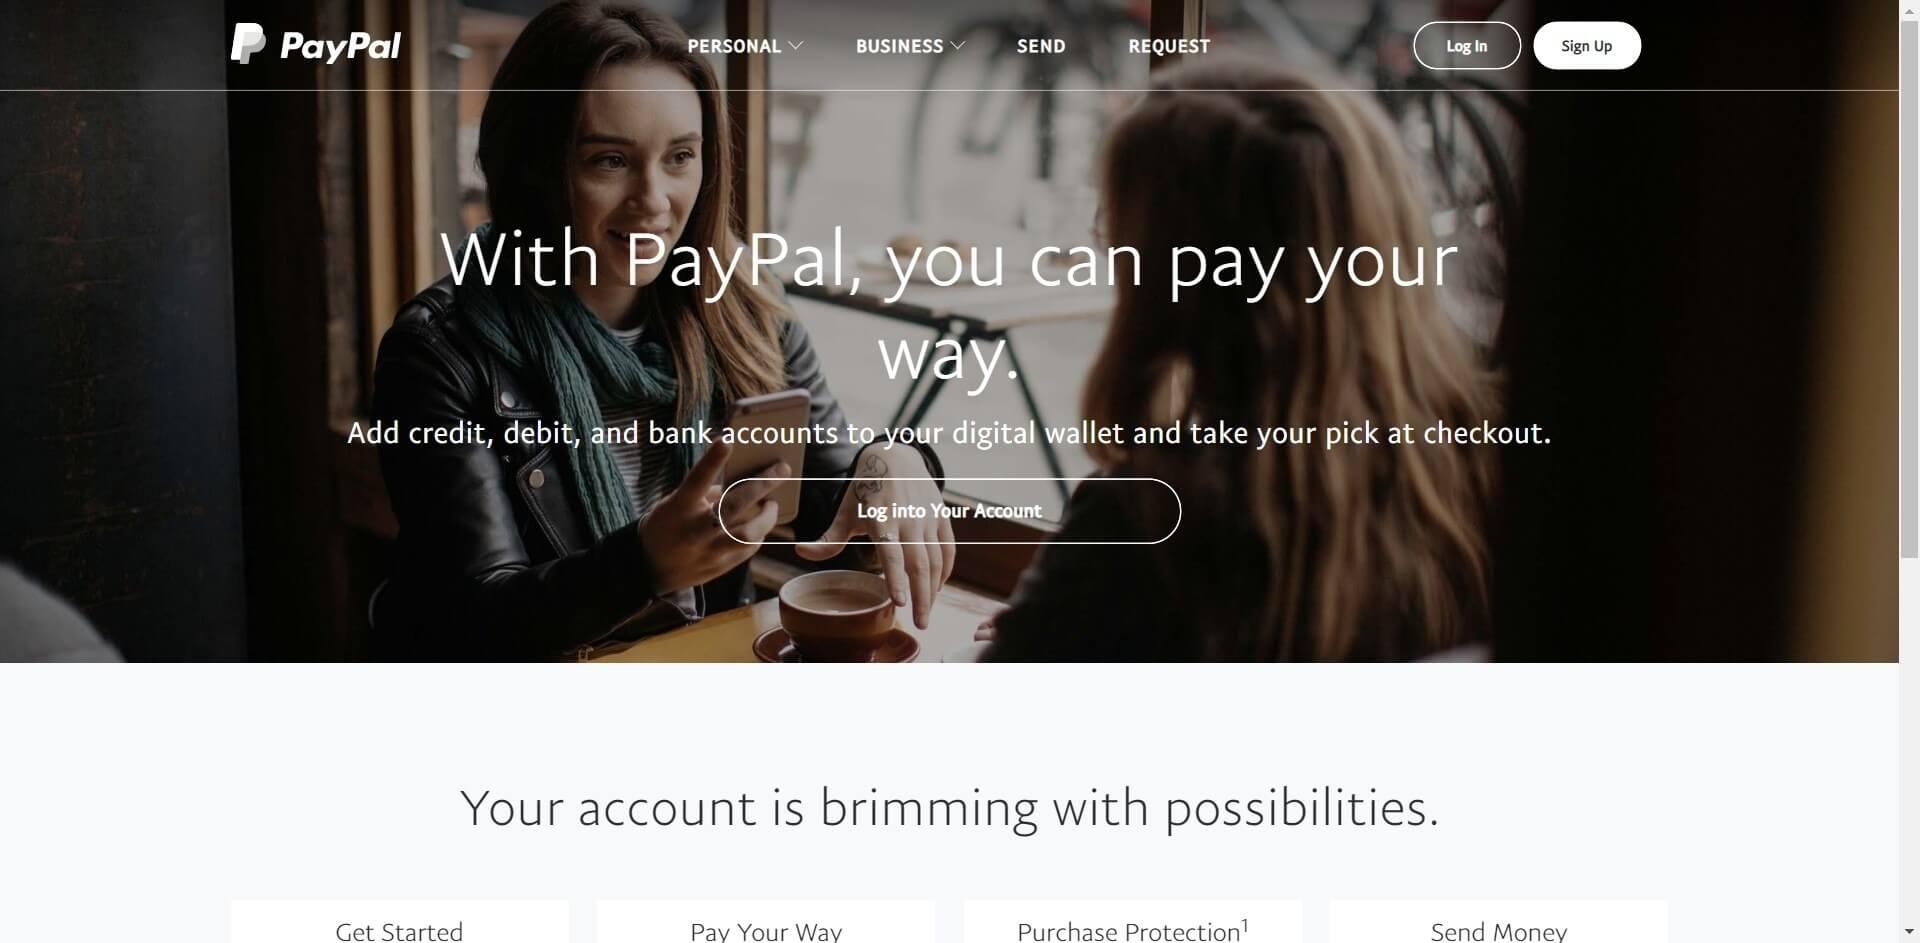 Paypal image